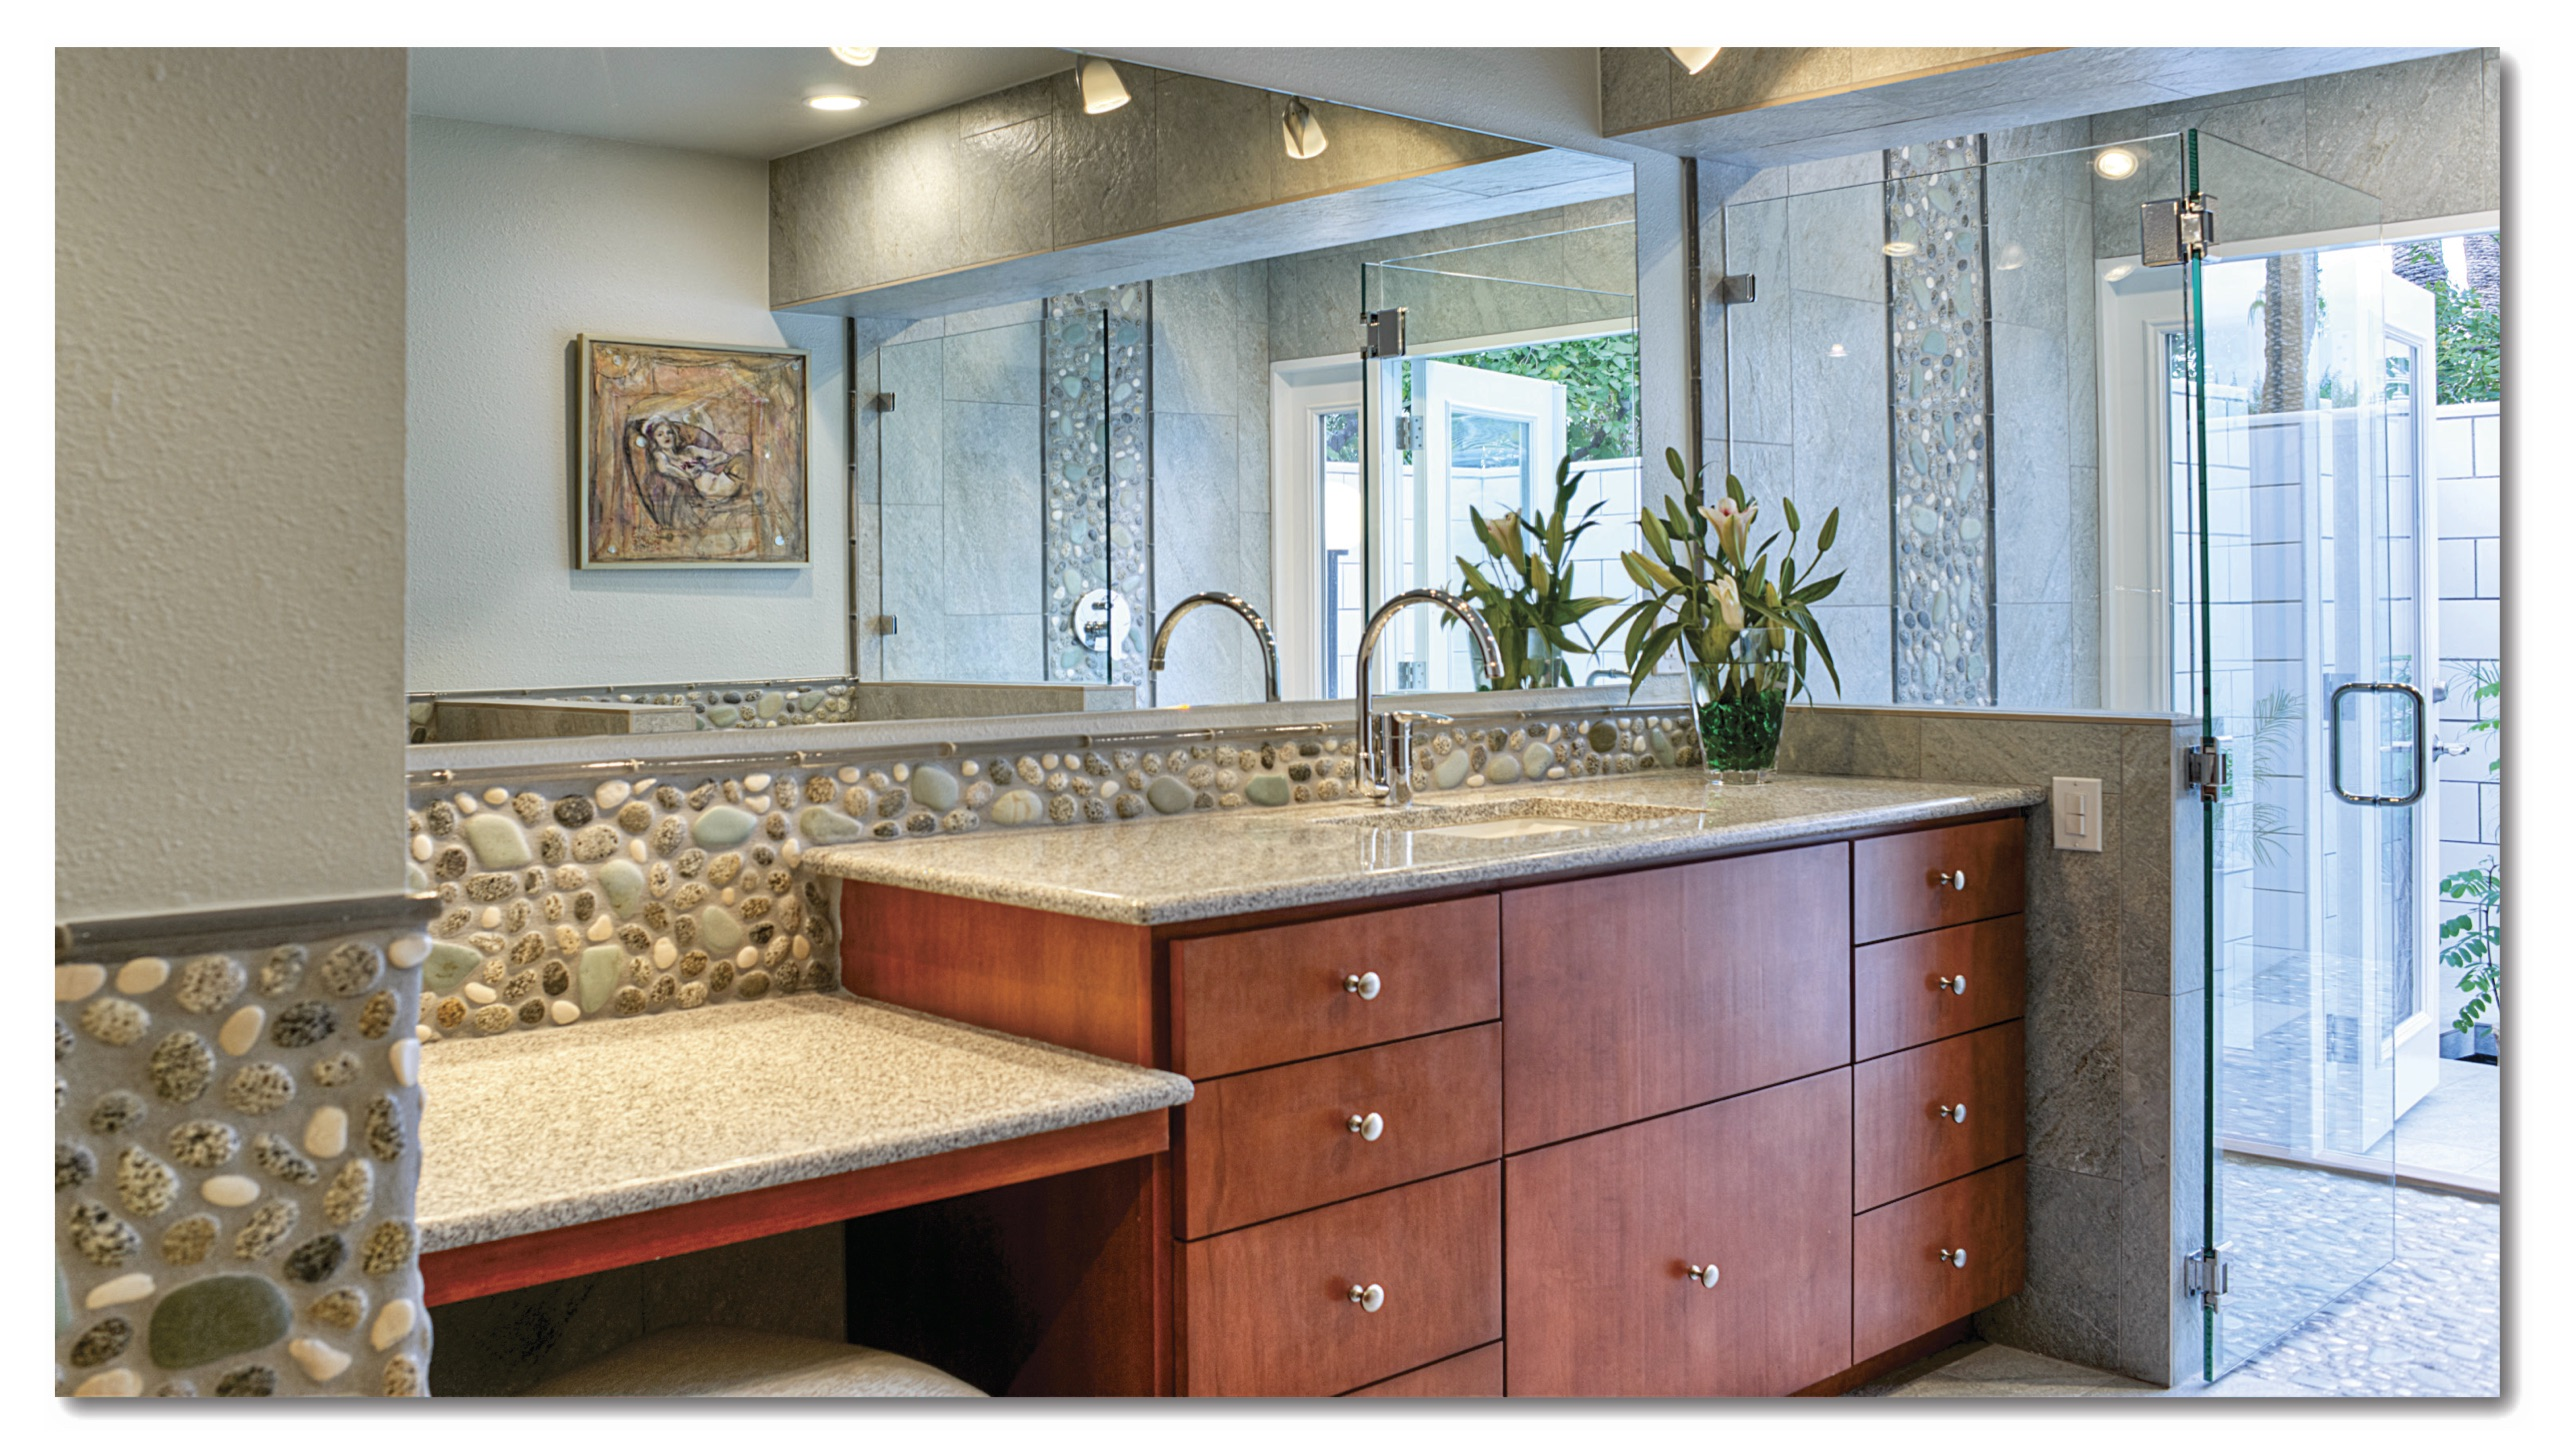 NKBA Awards  Best Bath To Allure Designs LLC  TileLetter -  national kitchen and bath association